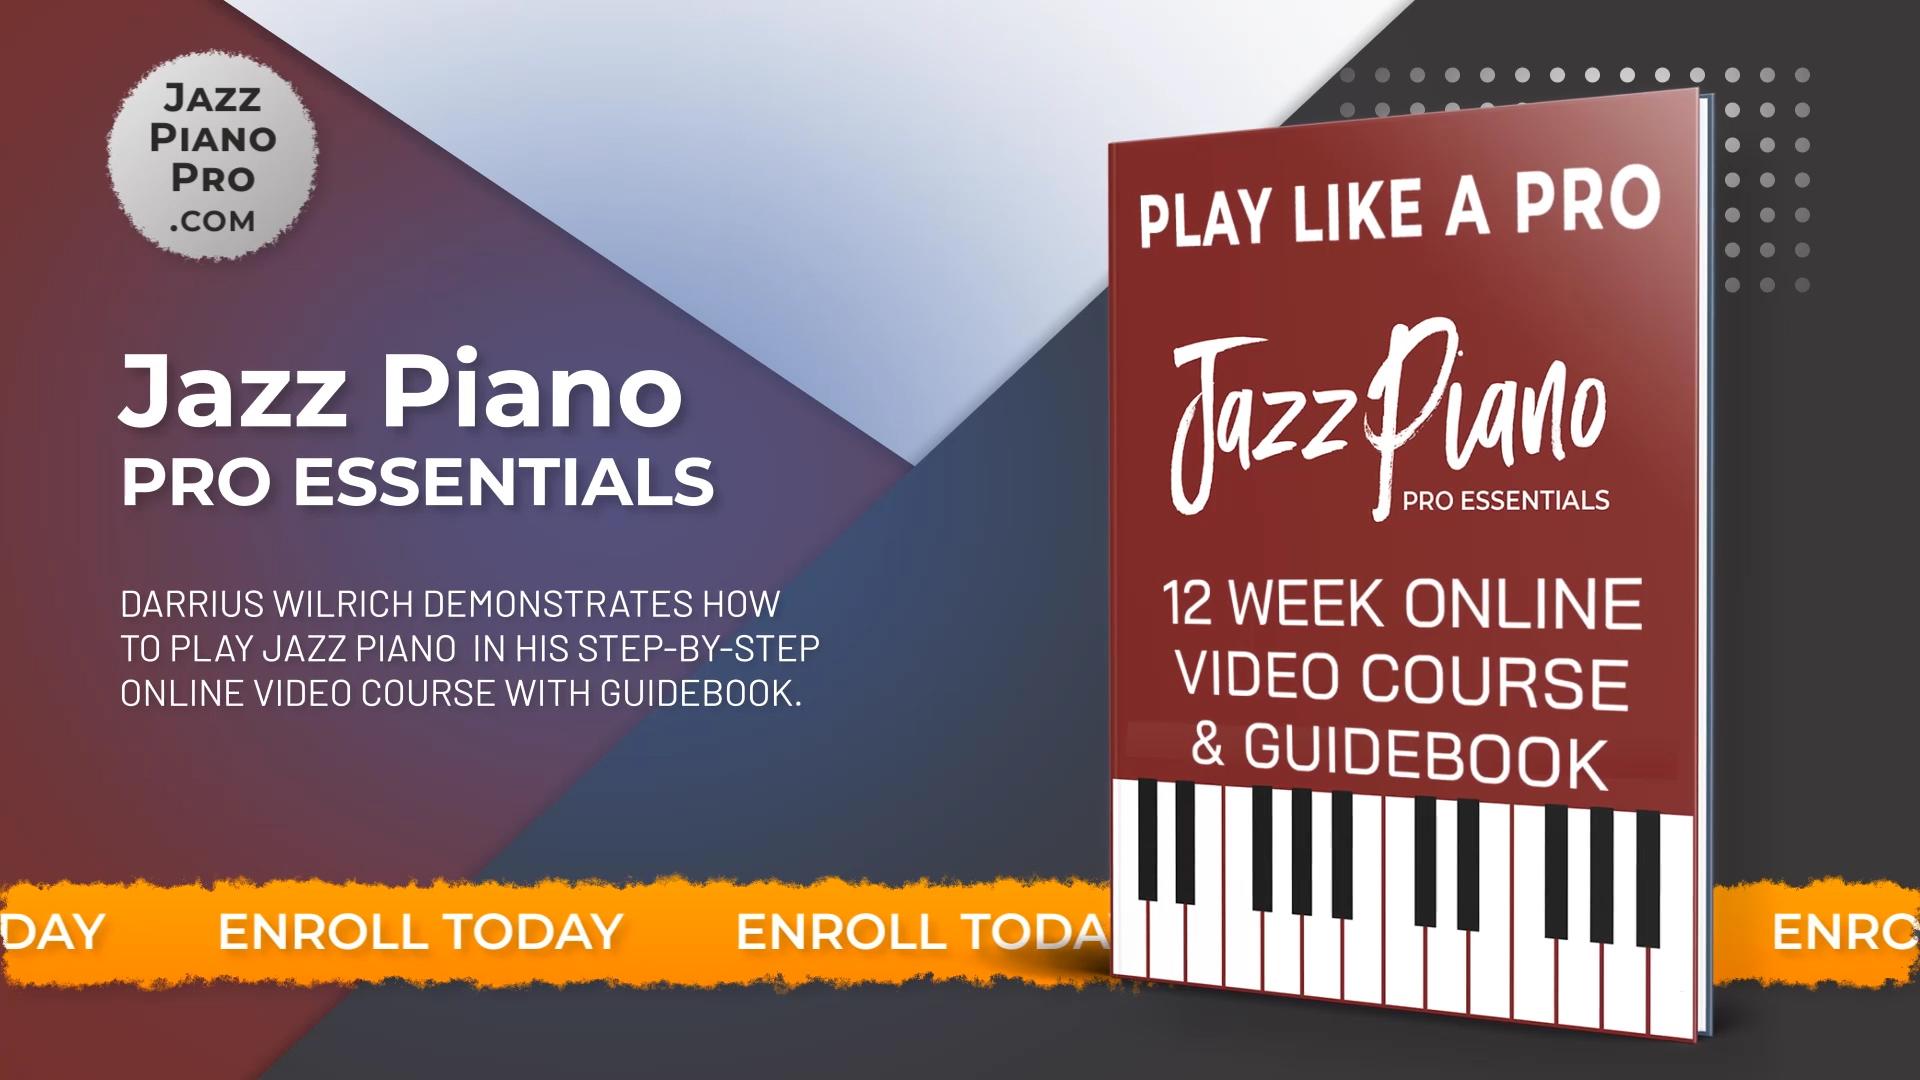 Jazz Piano Pro Website